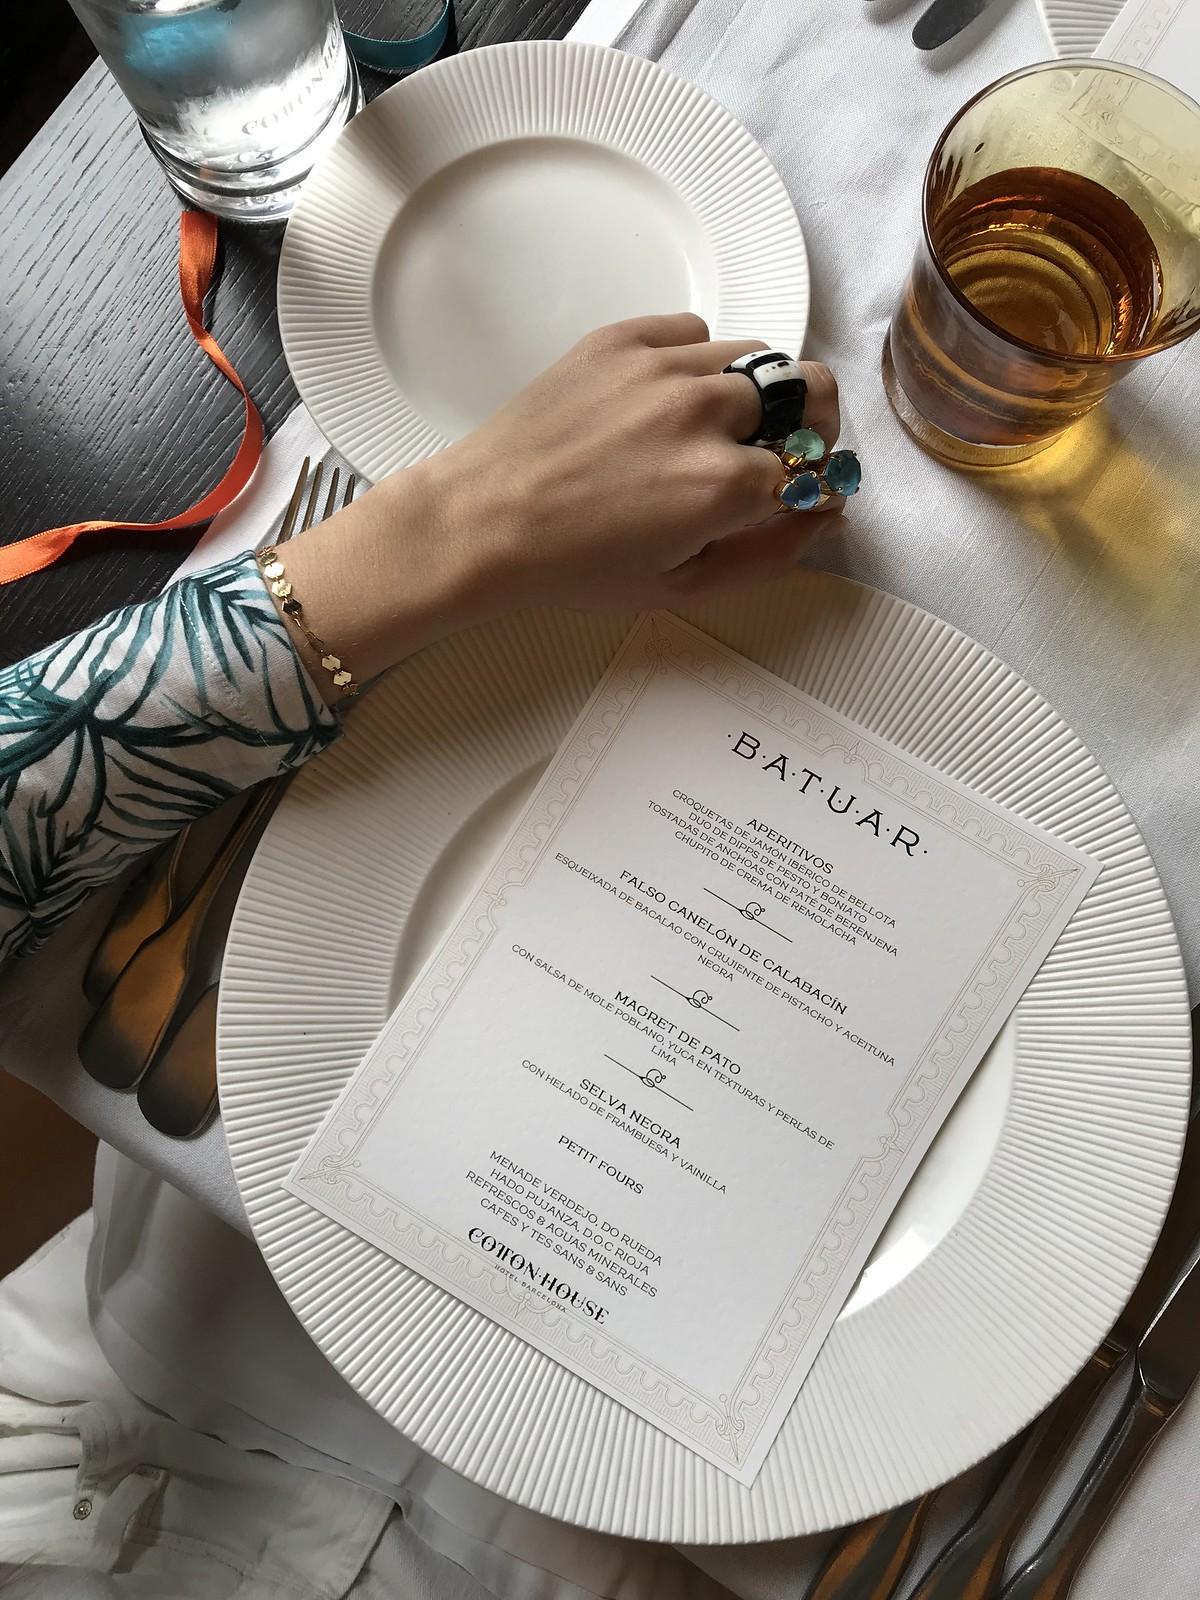 04_cotton_house_barcelona_hotel_restaurante_lujo_influencer_theguestgirl_laura_santolaria